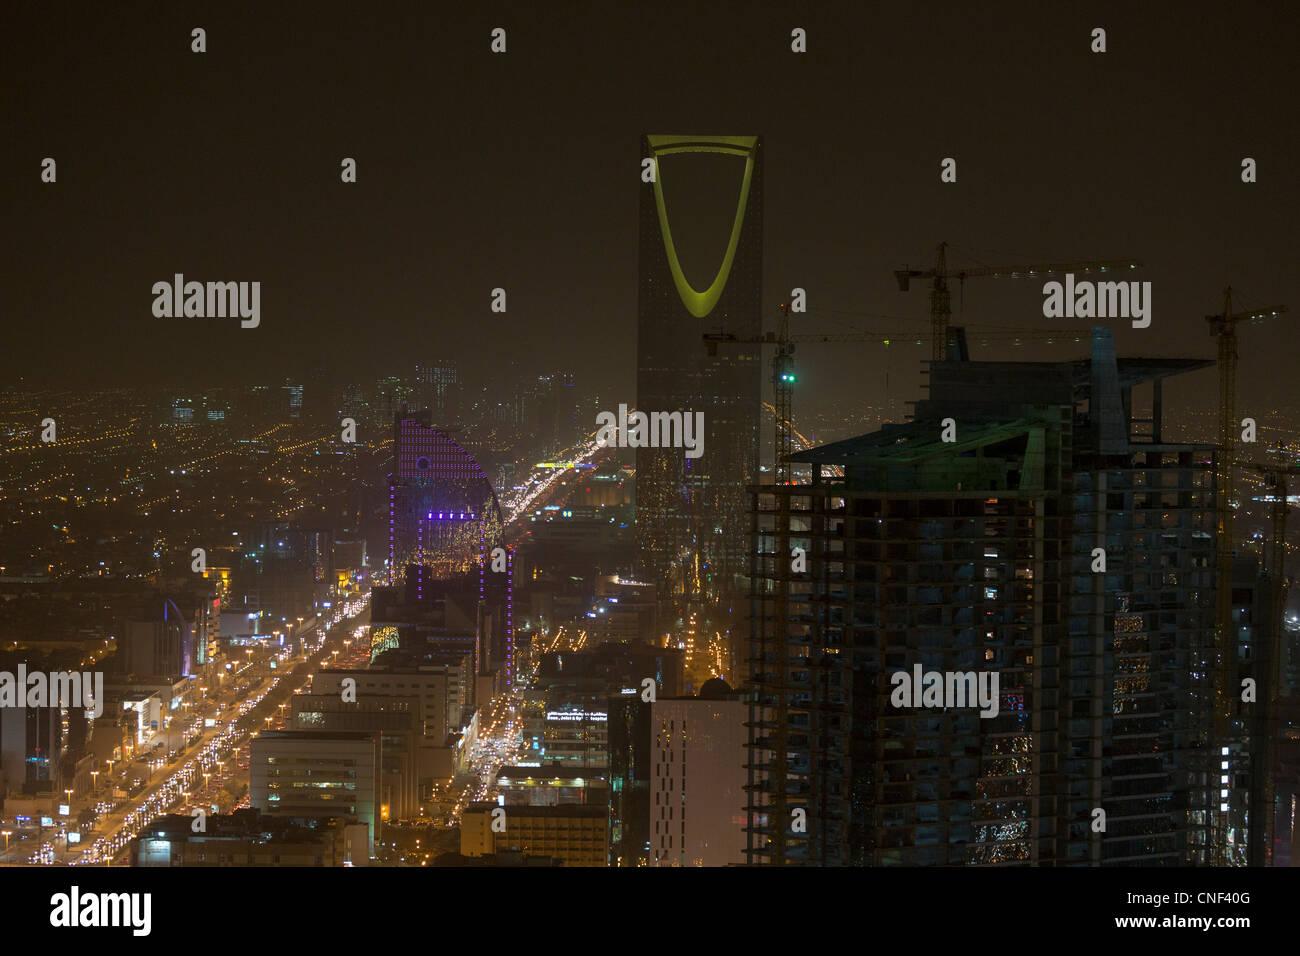 Vista di Riyadh, Arabia Saudita Immagini Stock